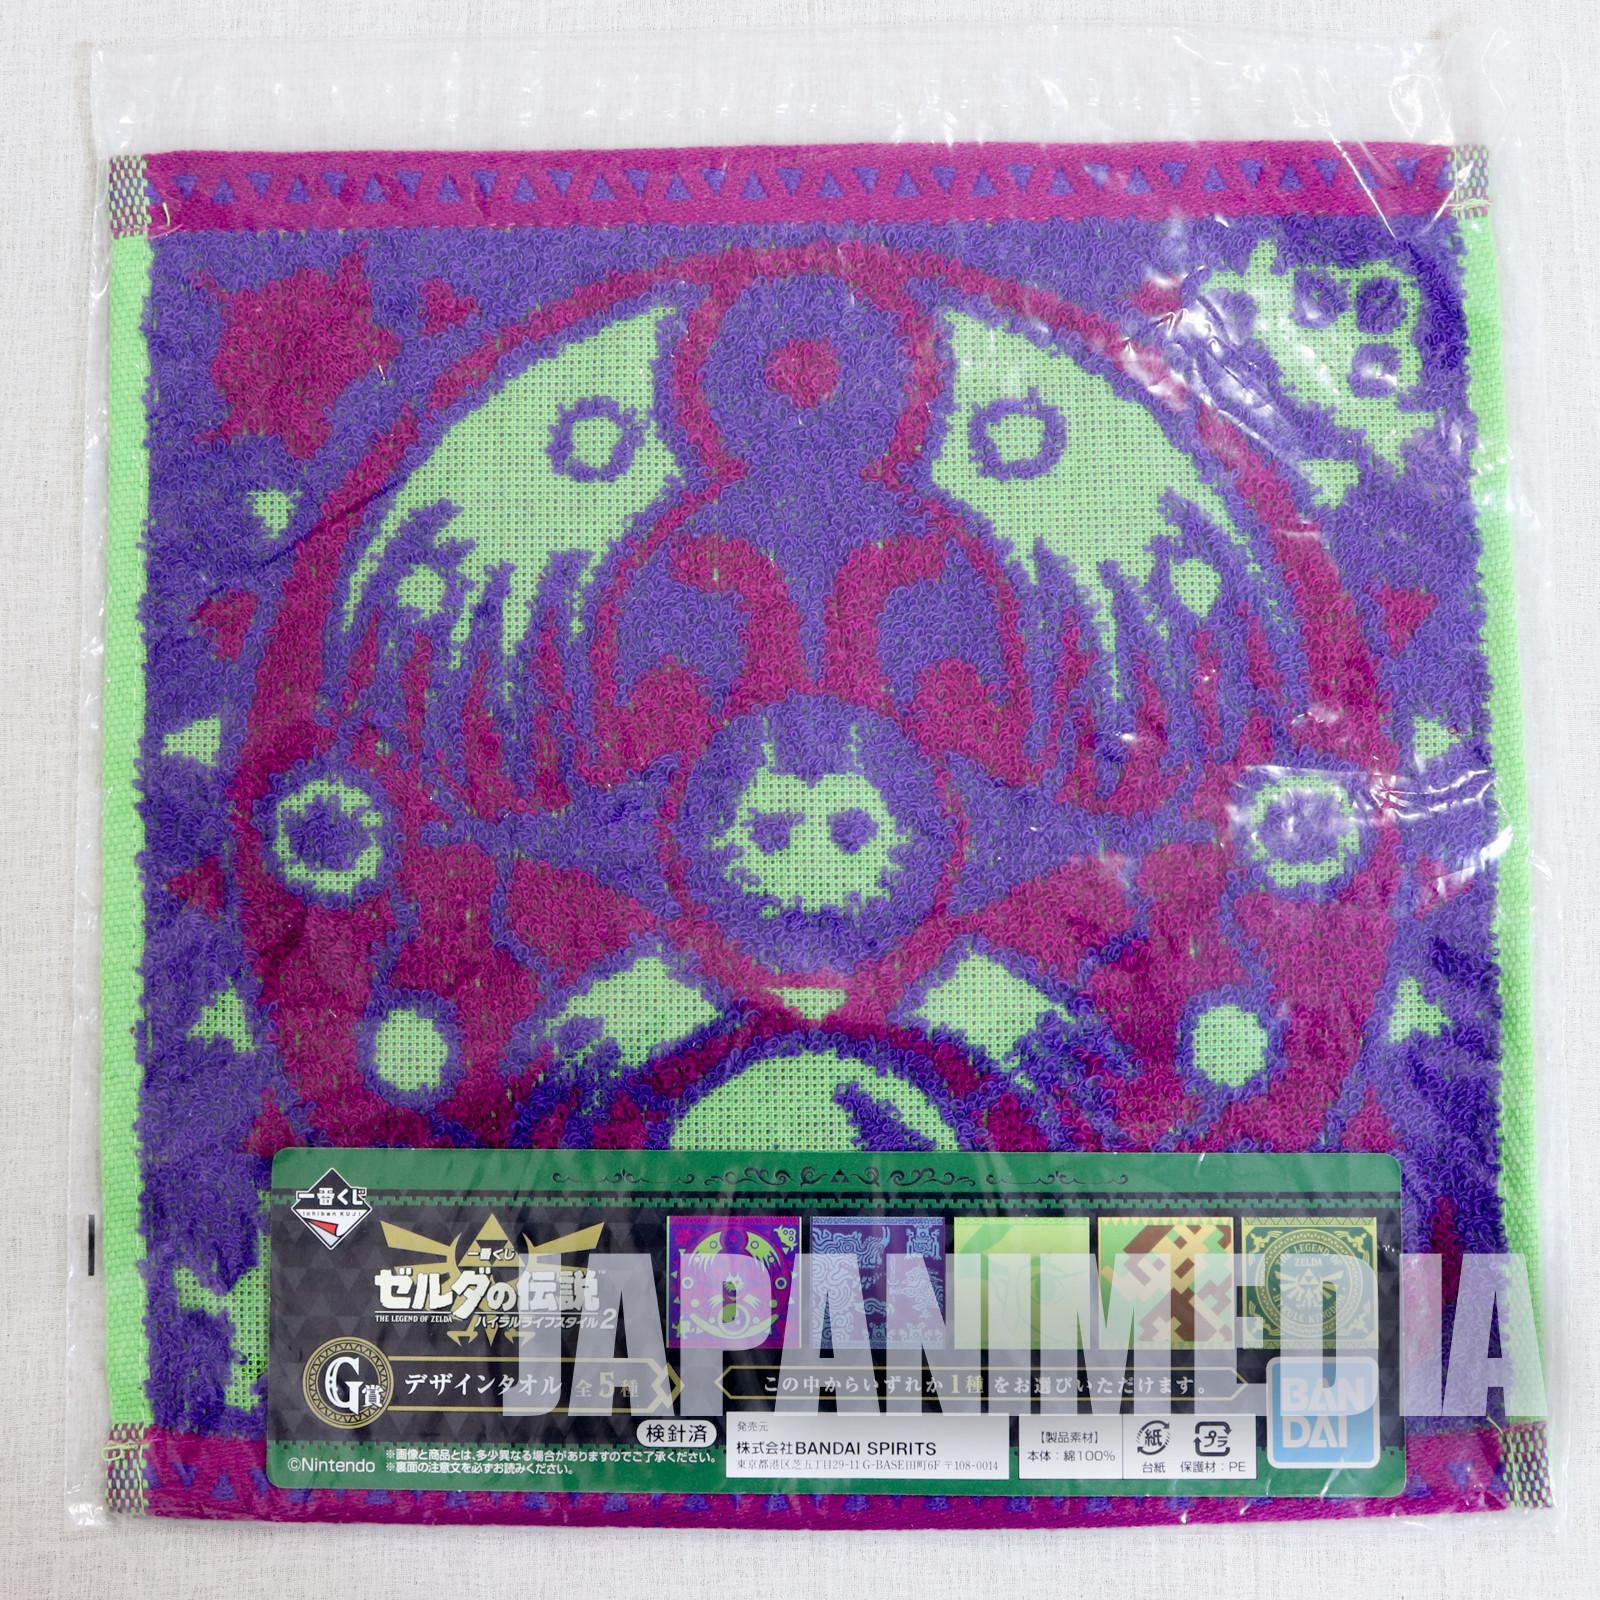 The Legend of Zelda Hyrule Life Design Towel 10x10 inch #1 Nintendo BANDAI